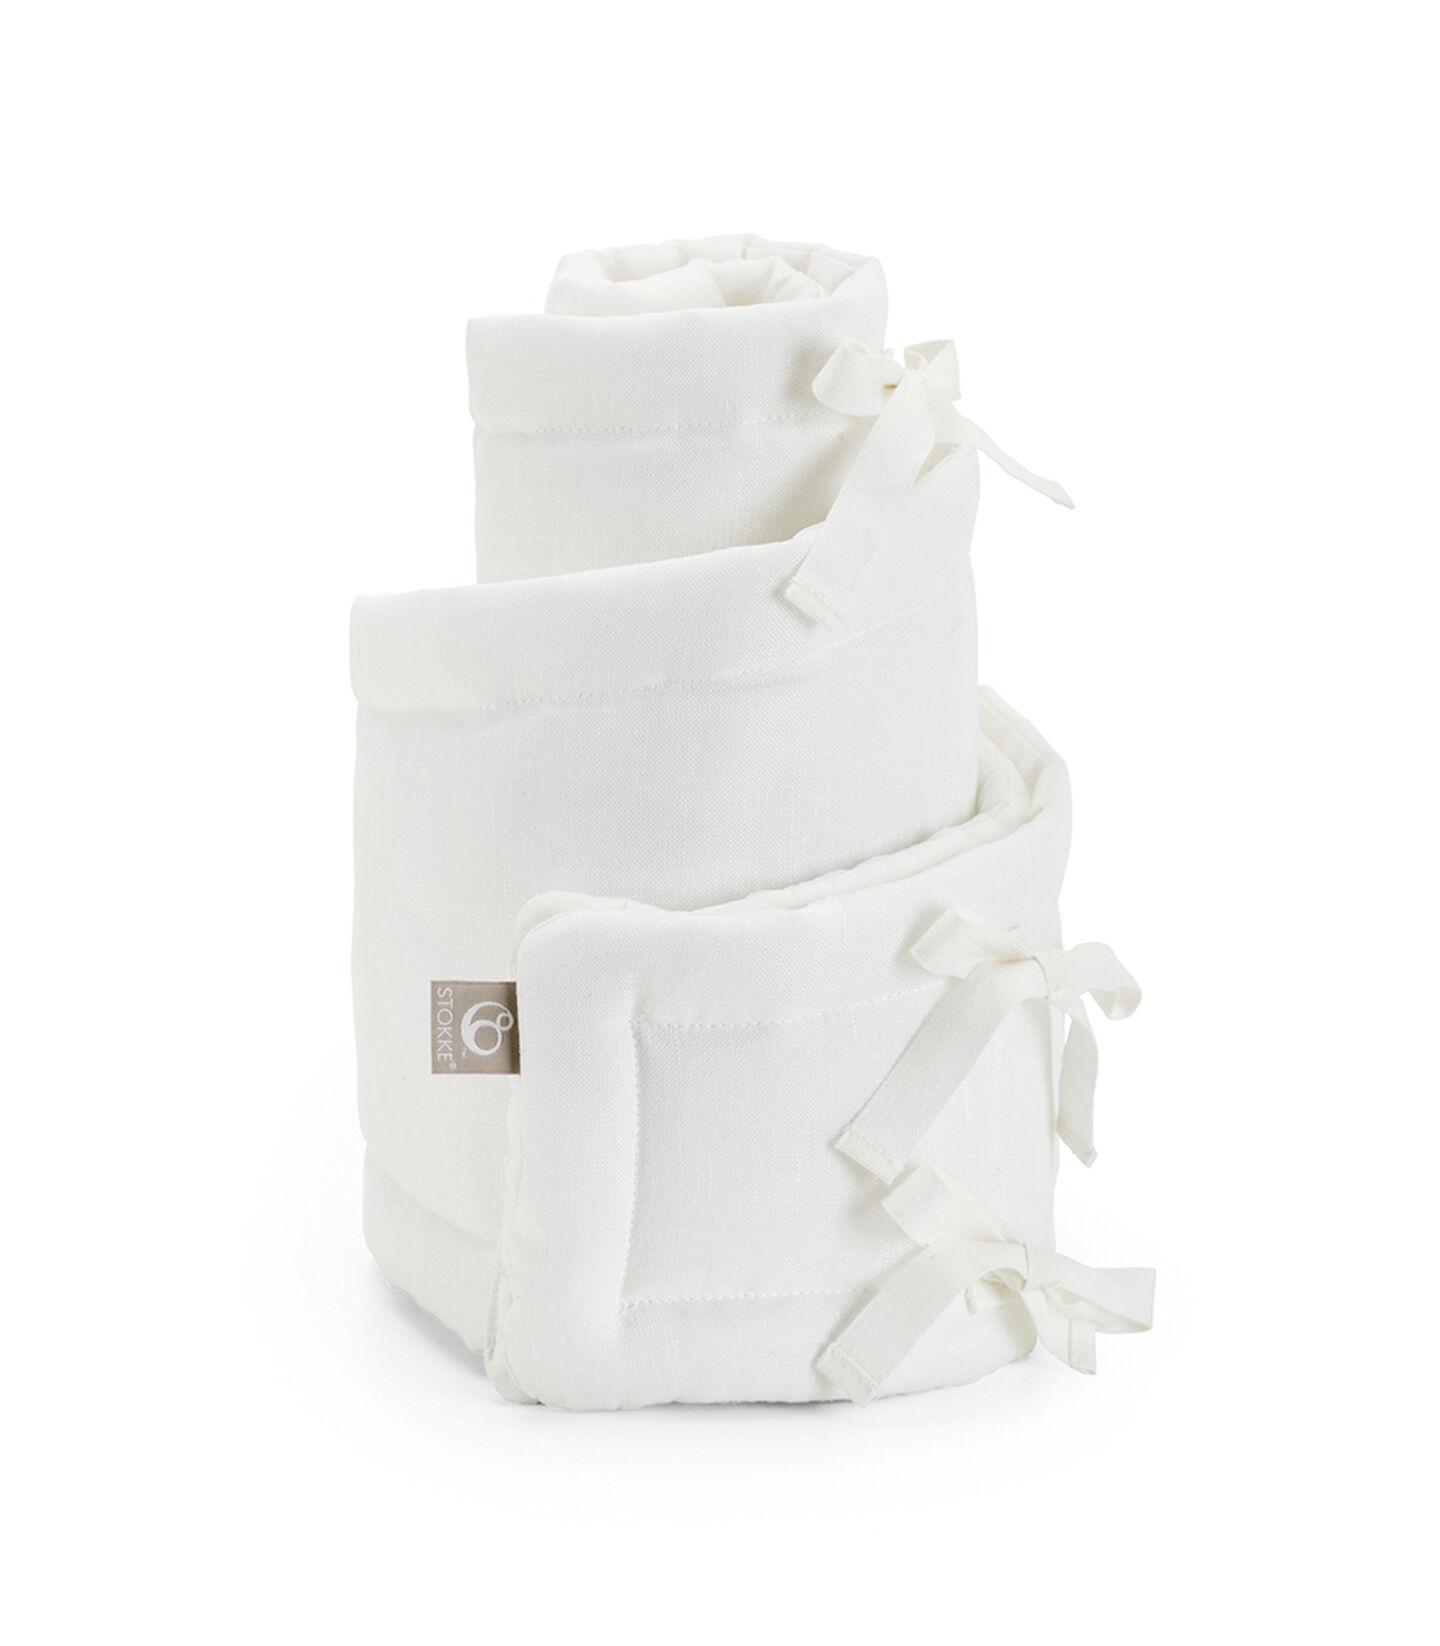 Stokke® Sleepi™ Mini Bumper White, White, mainview view 2